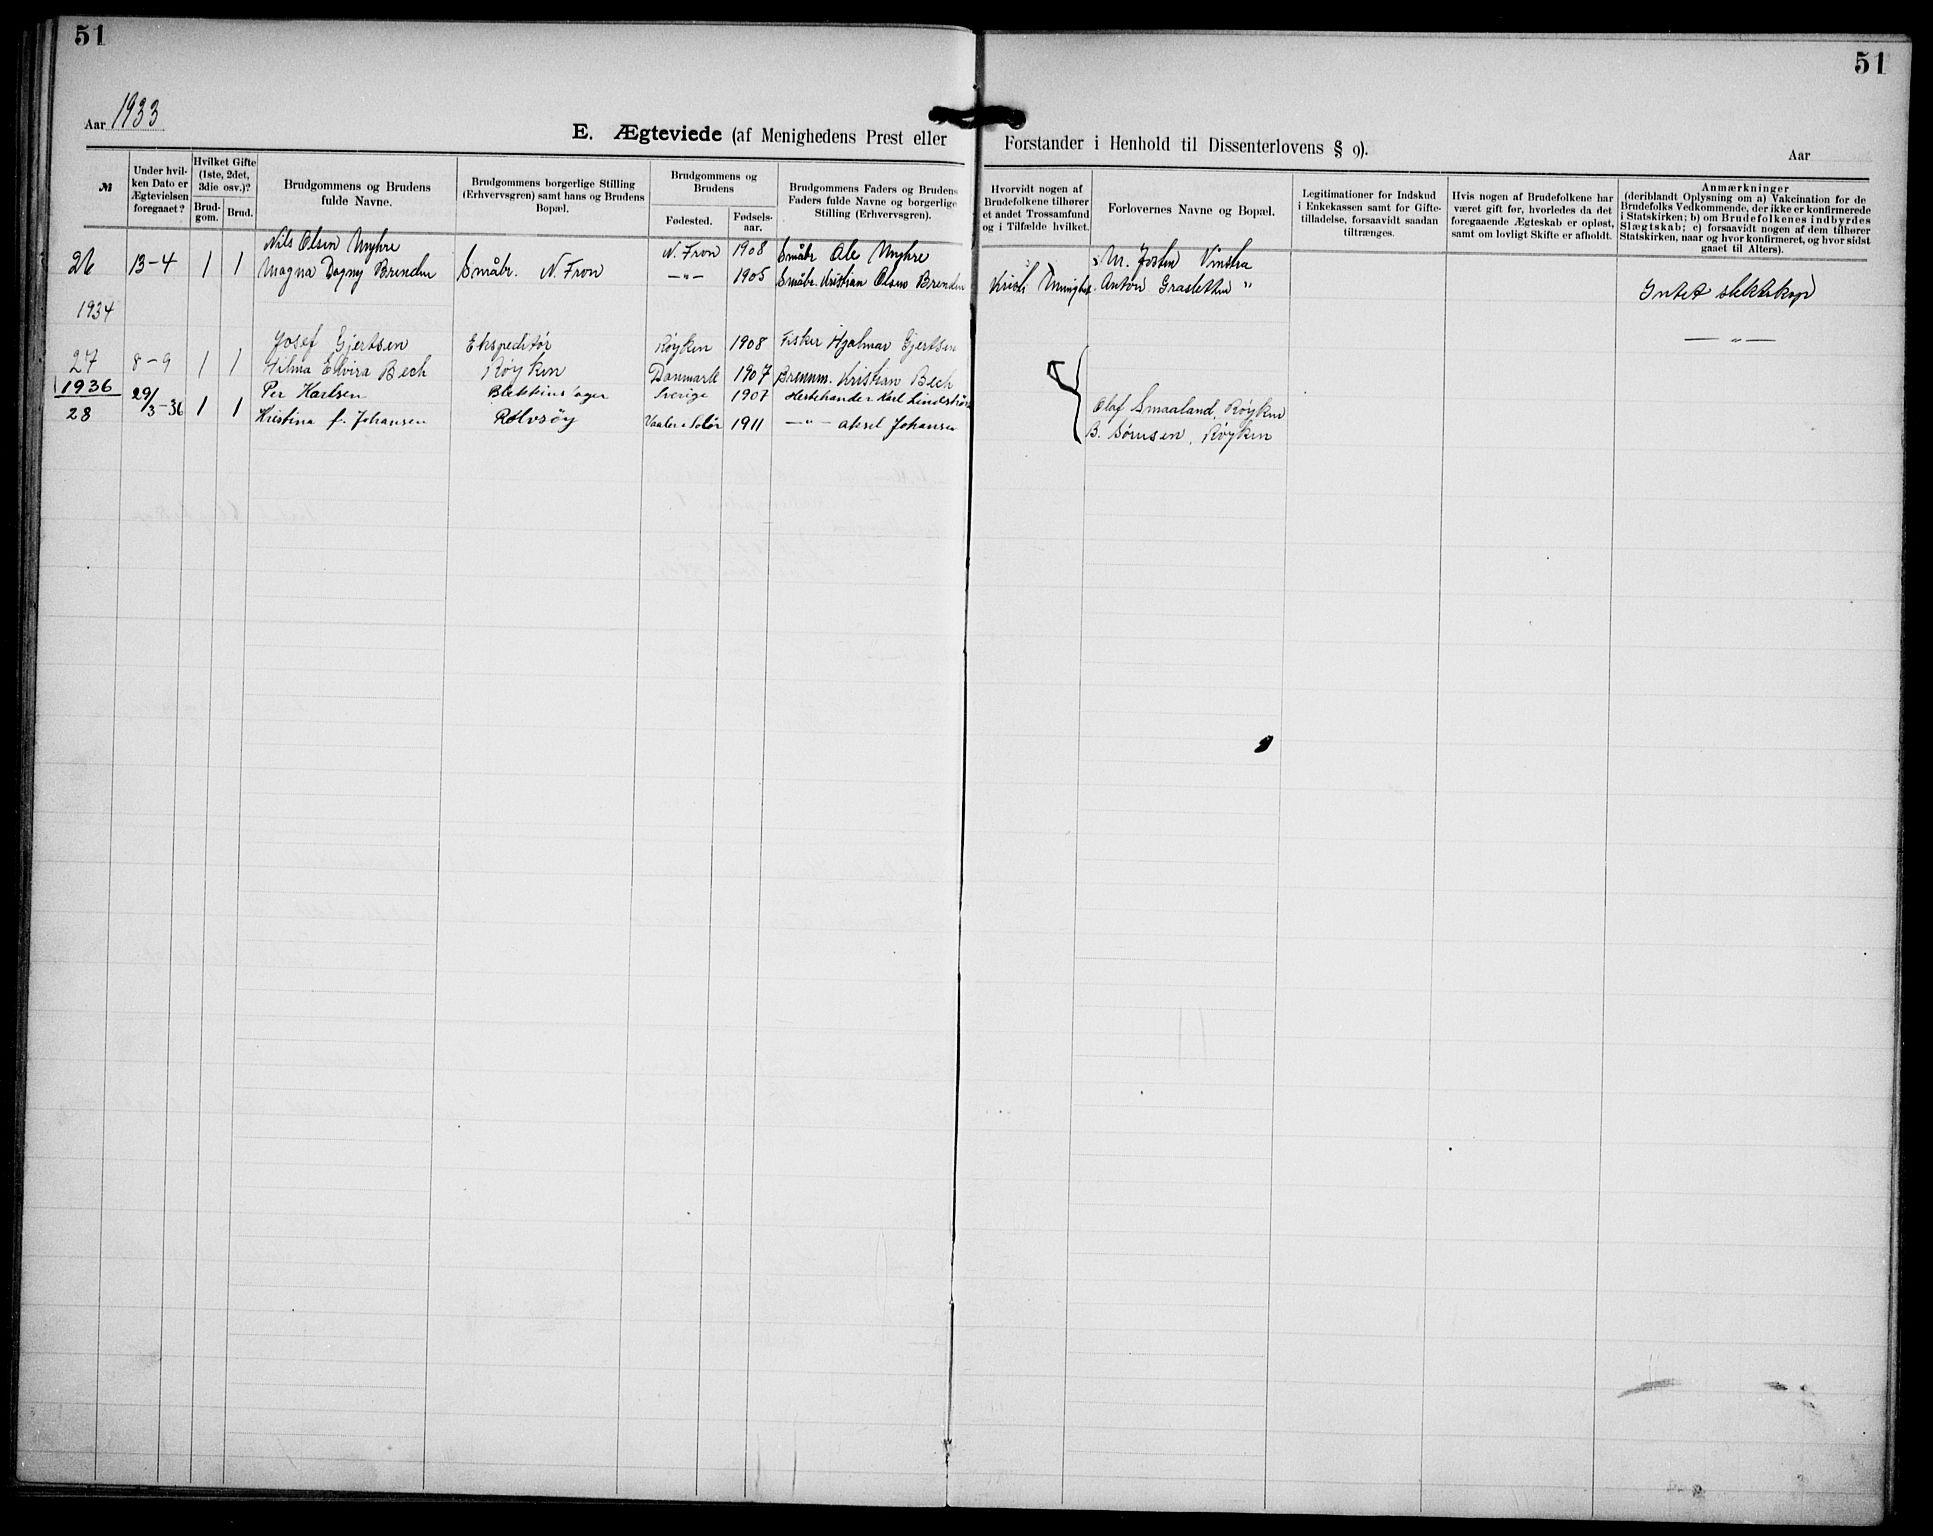 SAO, Kristi menighet Oslo , A/L0001: Dissenterprotokoll nr. 1, 1903-1938, s. 51